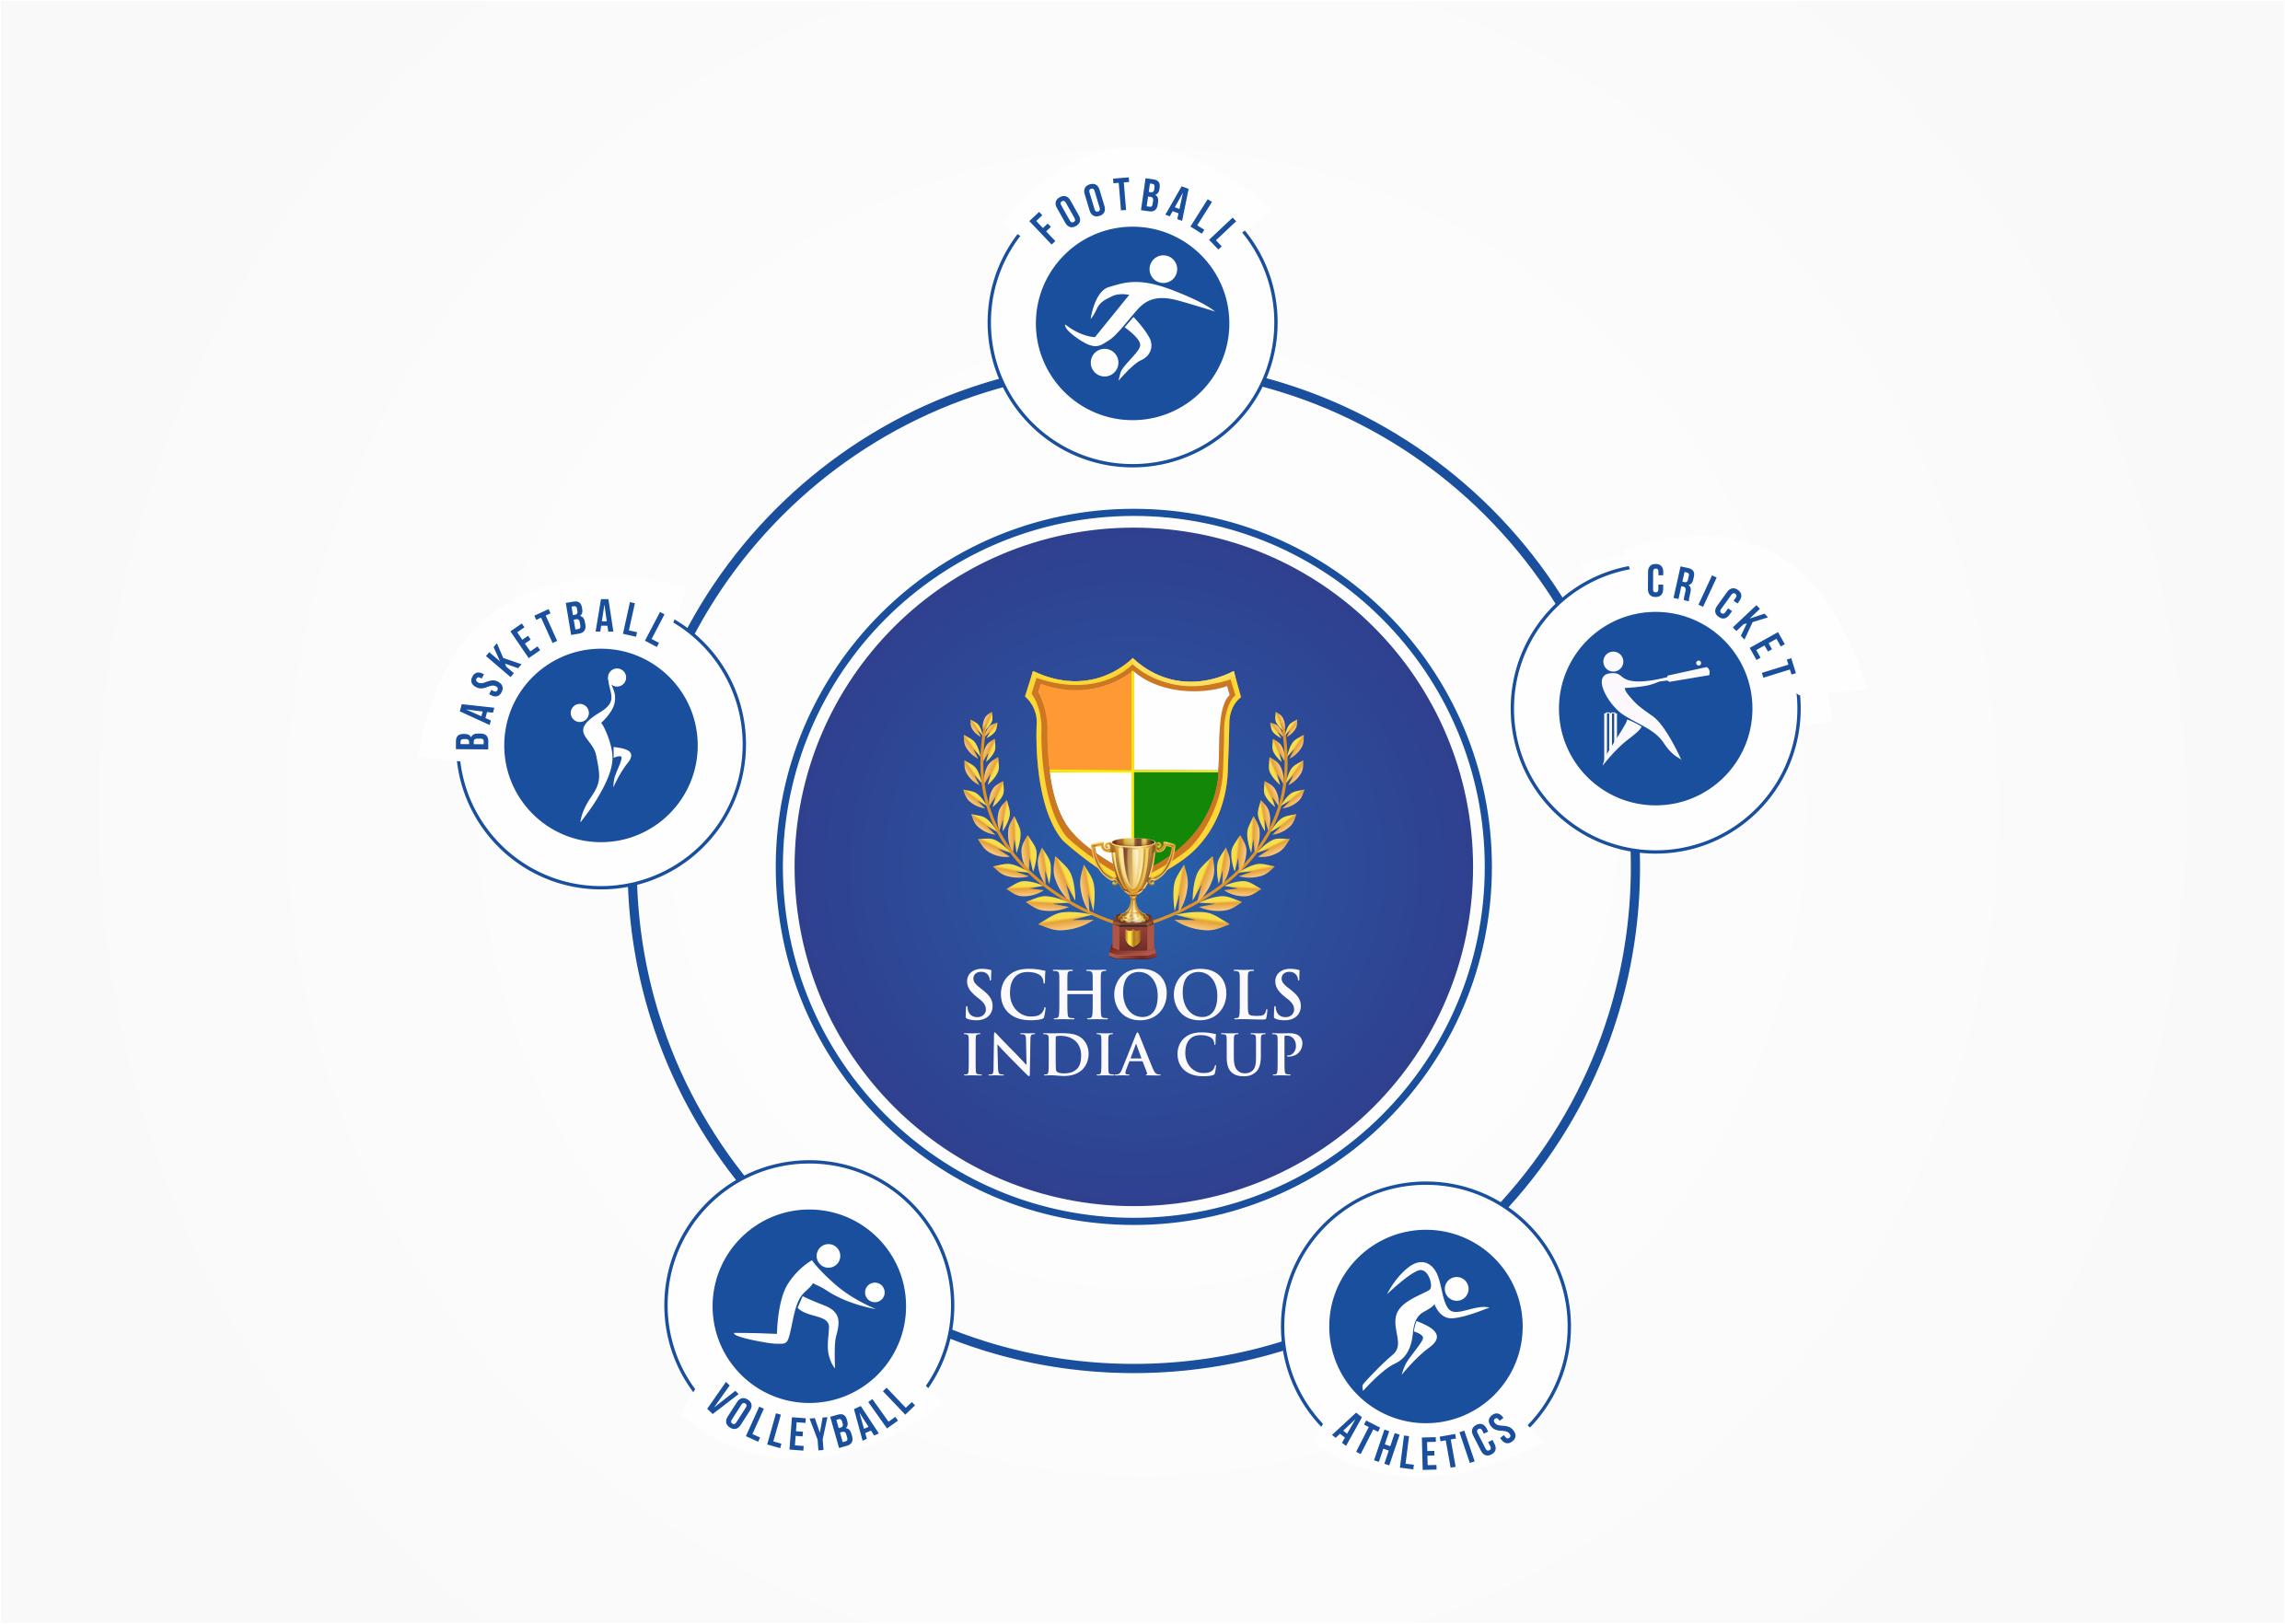 Schools India Cup